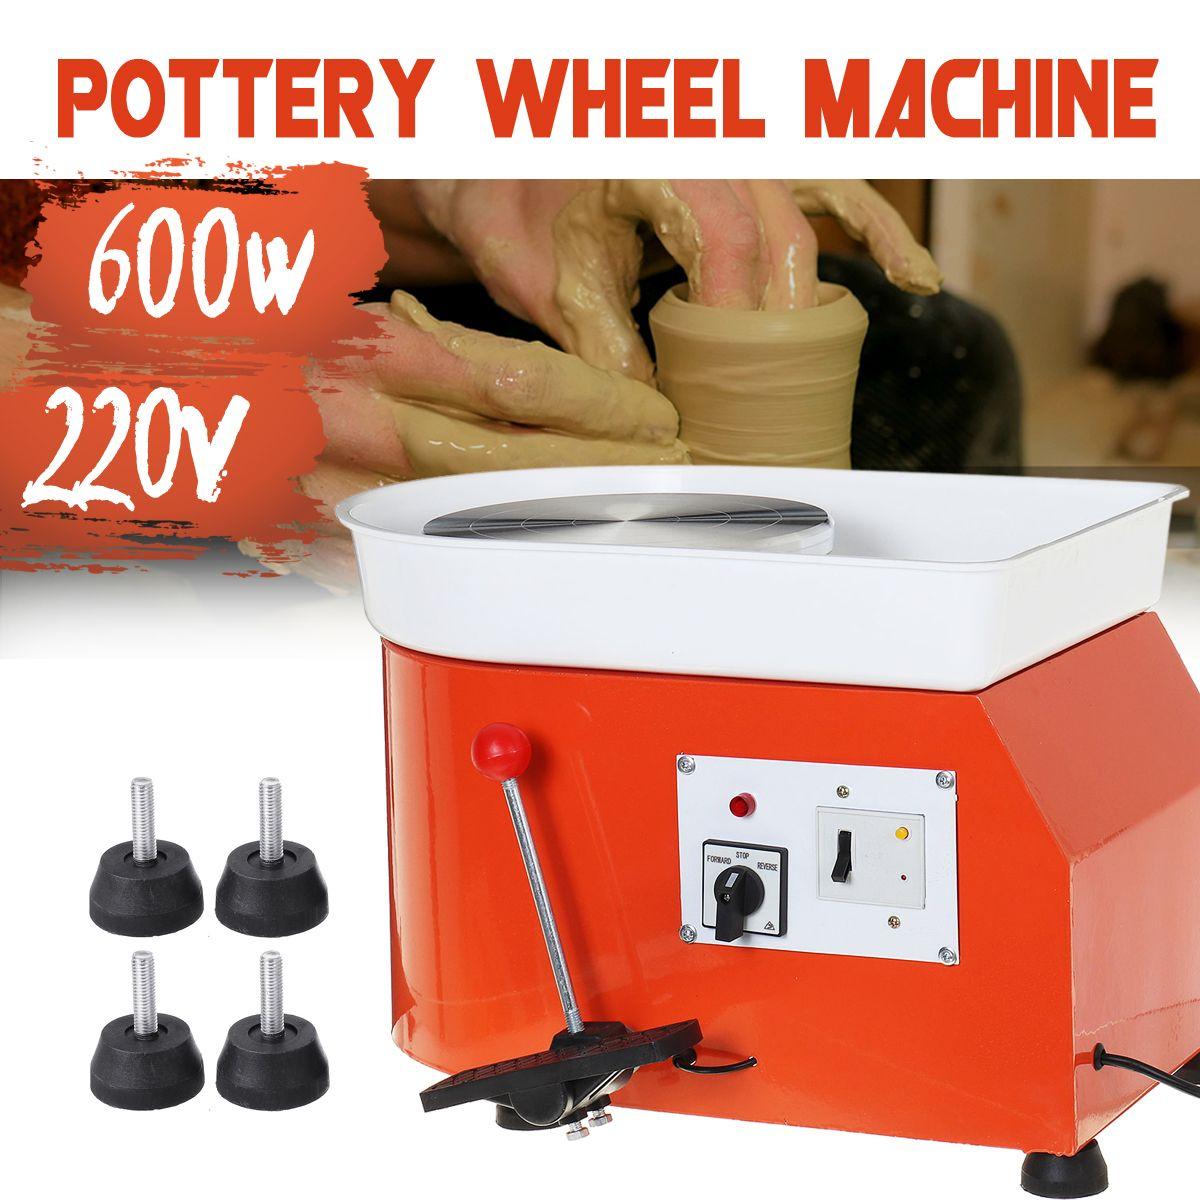 600W 25CM Electric Pottery Wheel Machine Ceramic Clay machine Work Clay Art Craft Foot Peda   #Banggood #600W #25CM #Electric #Pottery #Wheel #Machine #Ceramic #Clay #machine #Work #Clay #Art #Craft #Foot #Peda